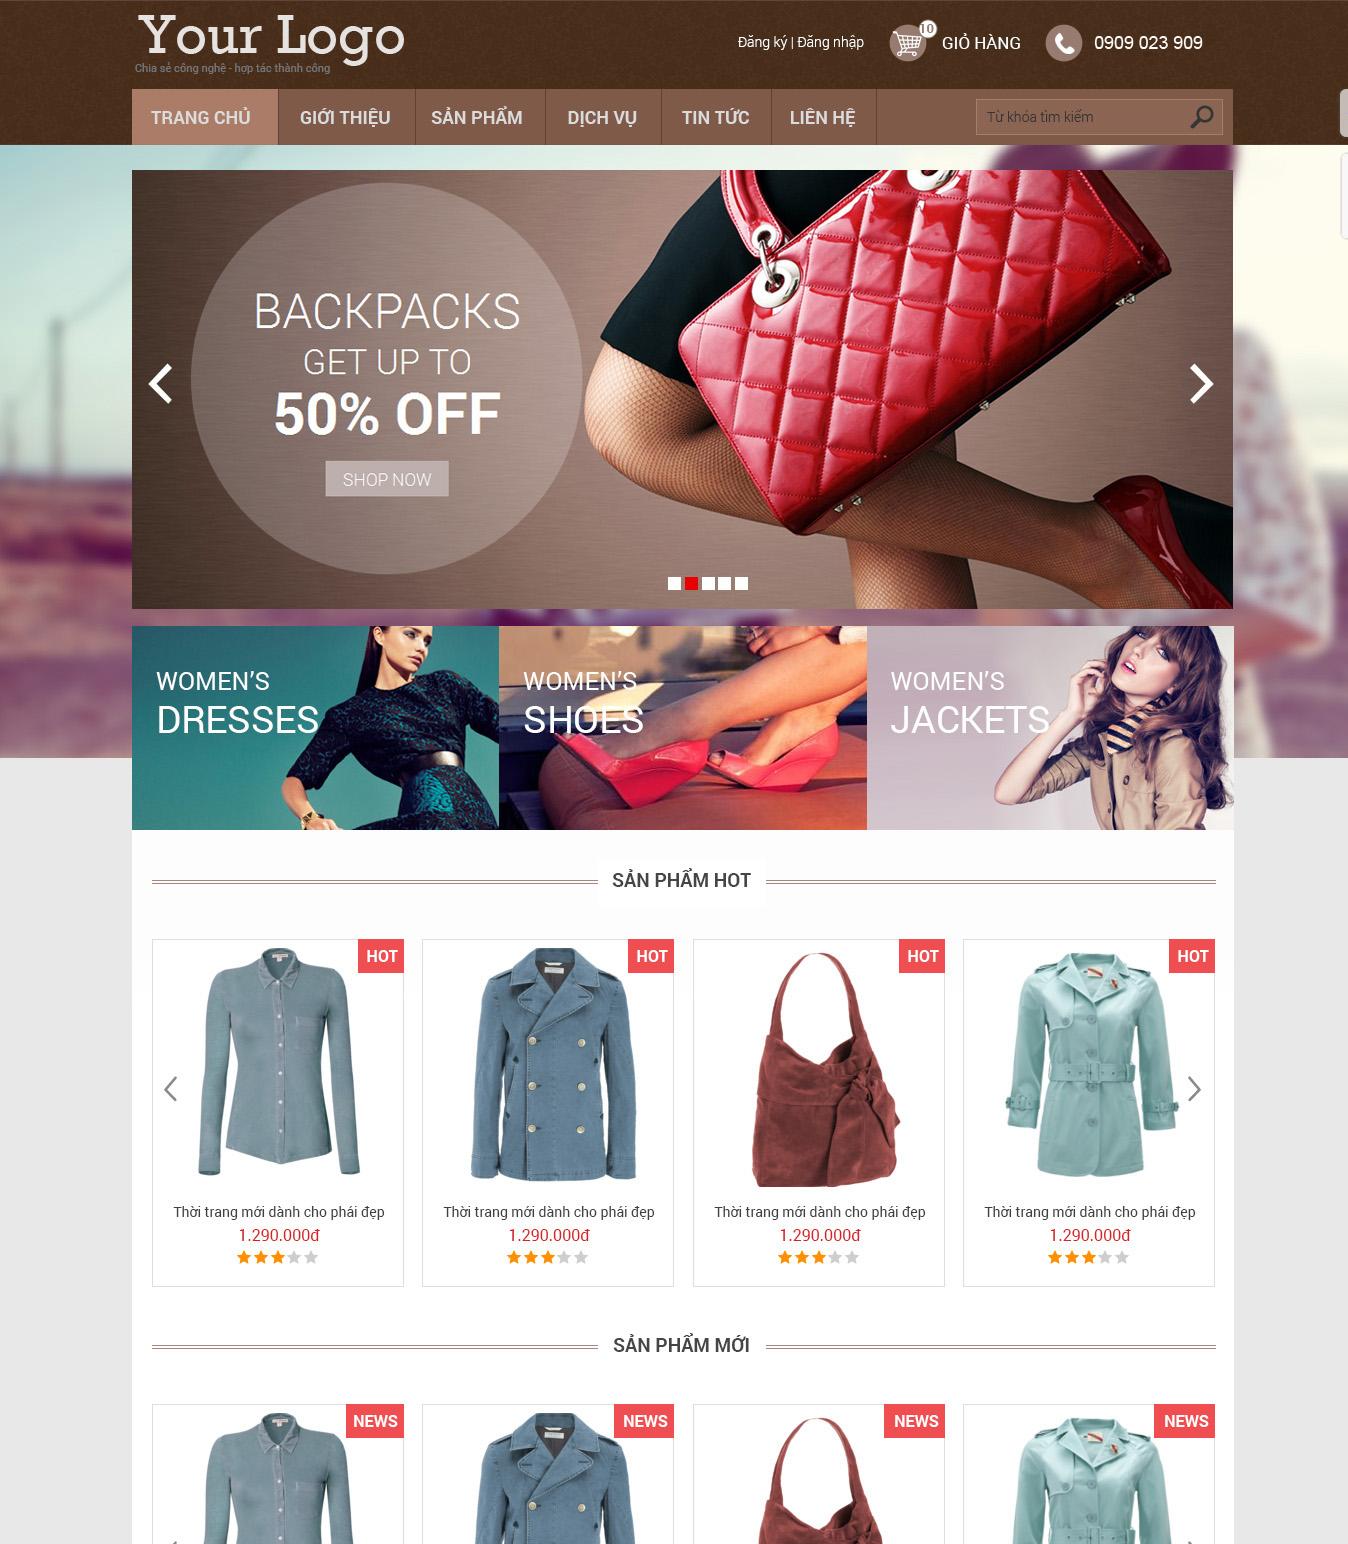 website thời trang3